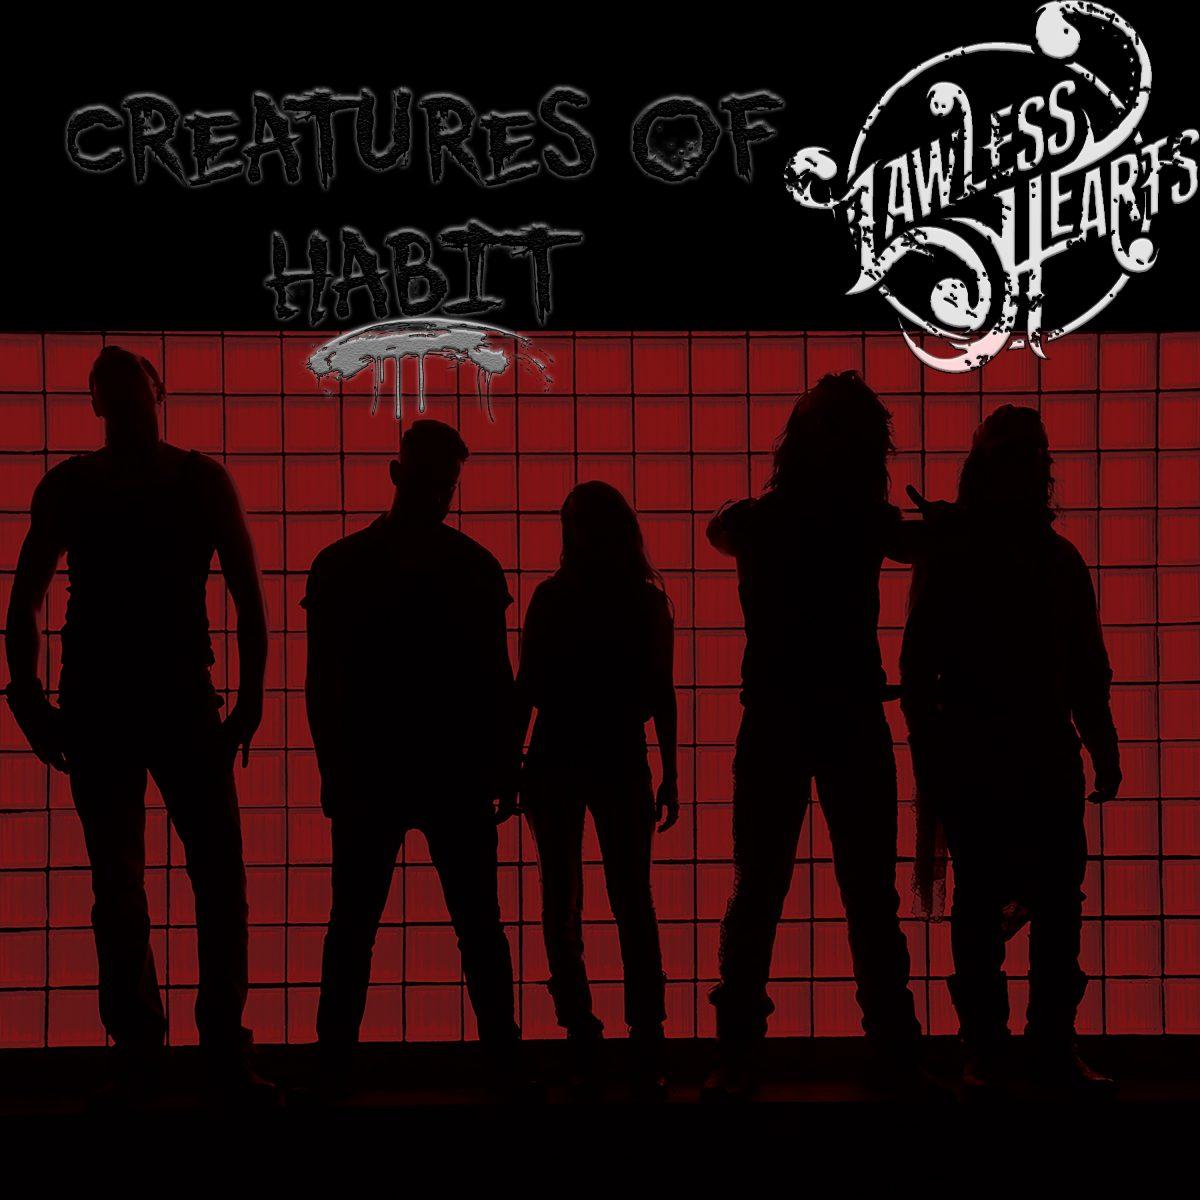 Header-CreaturesOfHabit-LawlessHearts-AlbumArt